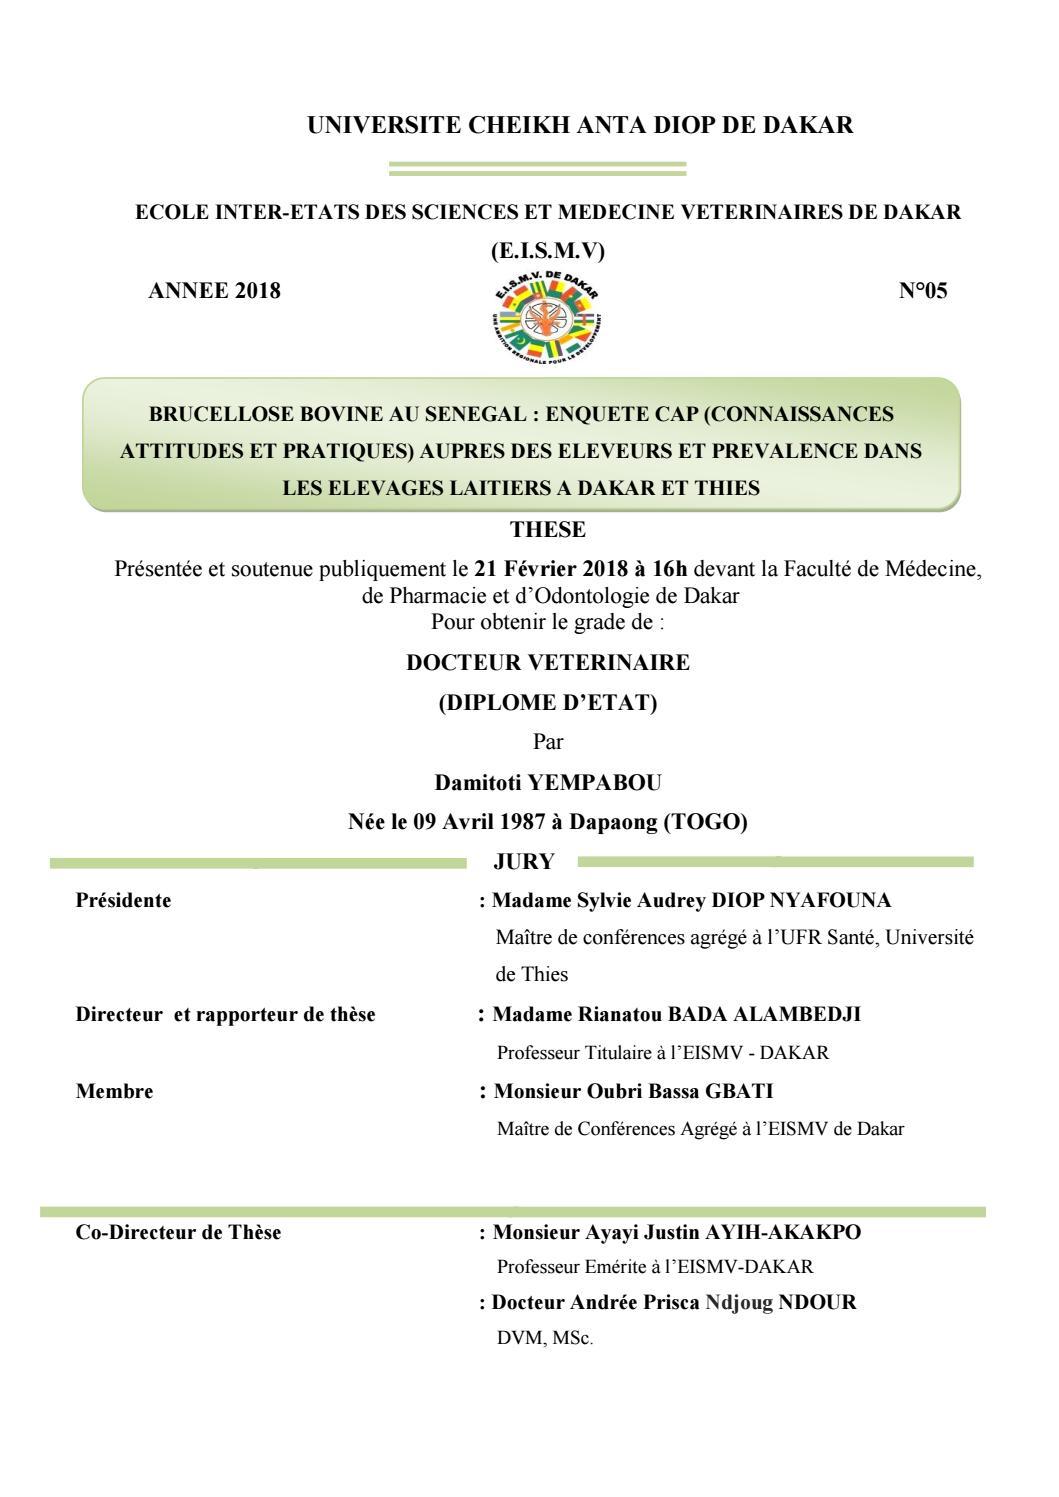 Inter By Ecole Yempabou Sciences Damitoti Etats Et Des Médecine v8mNnw0O